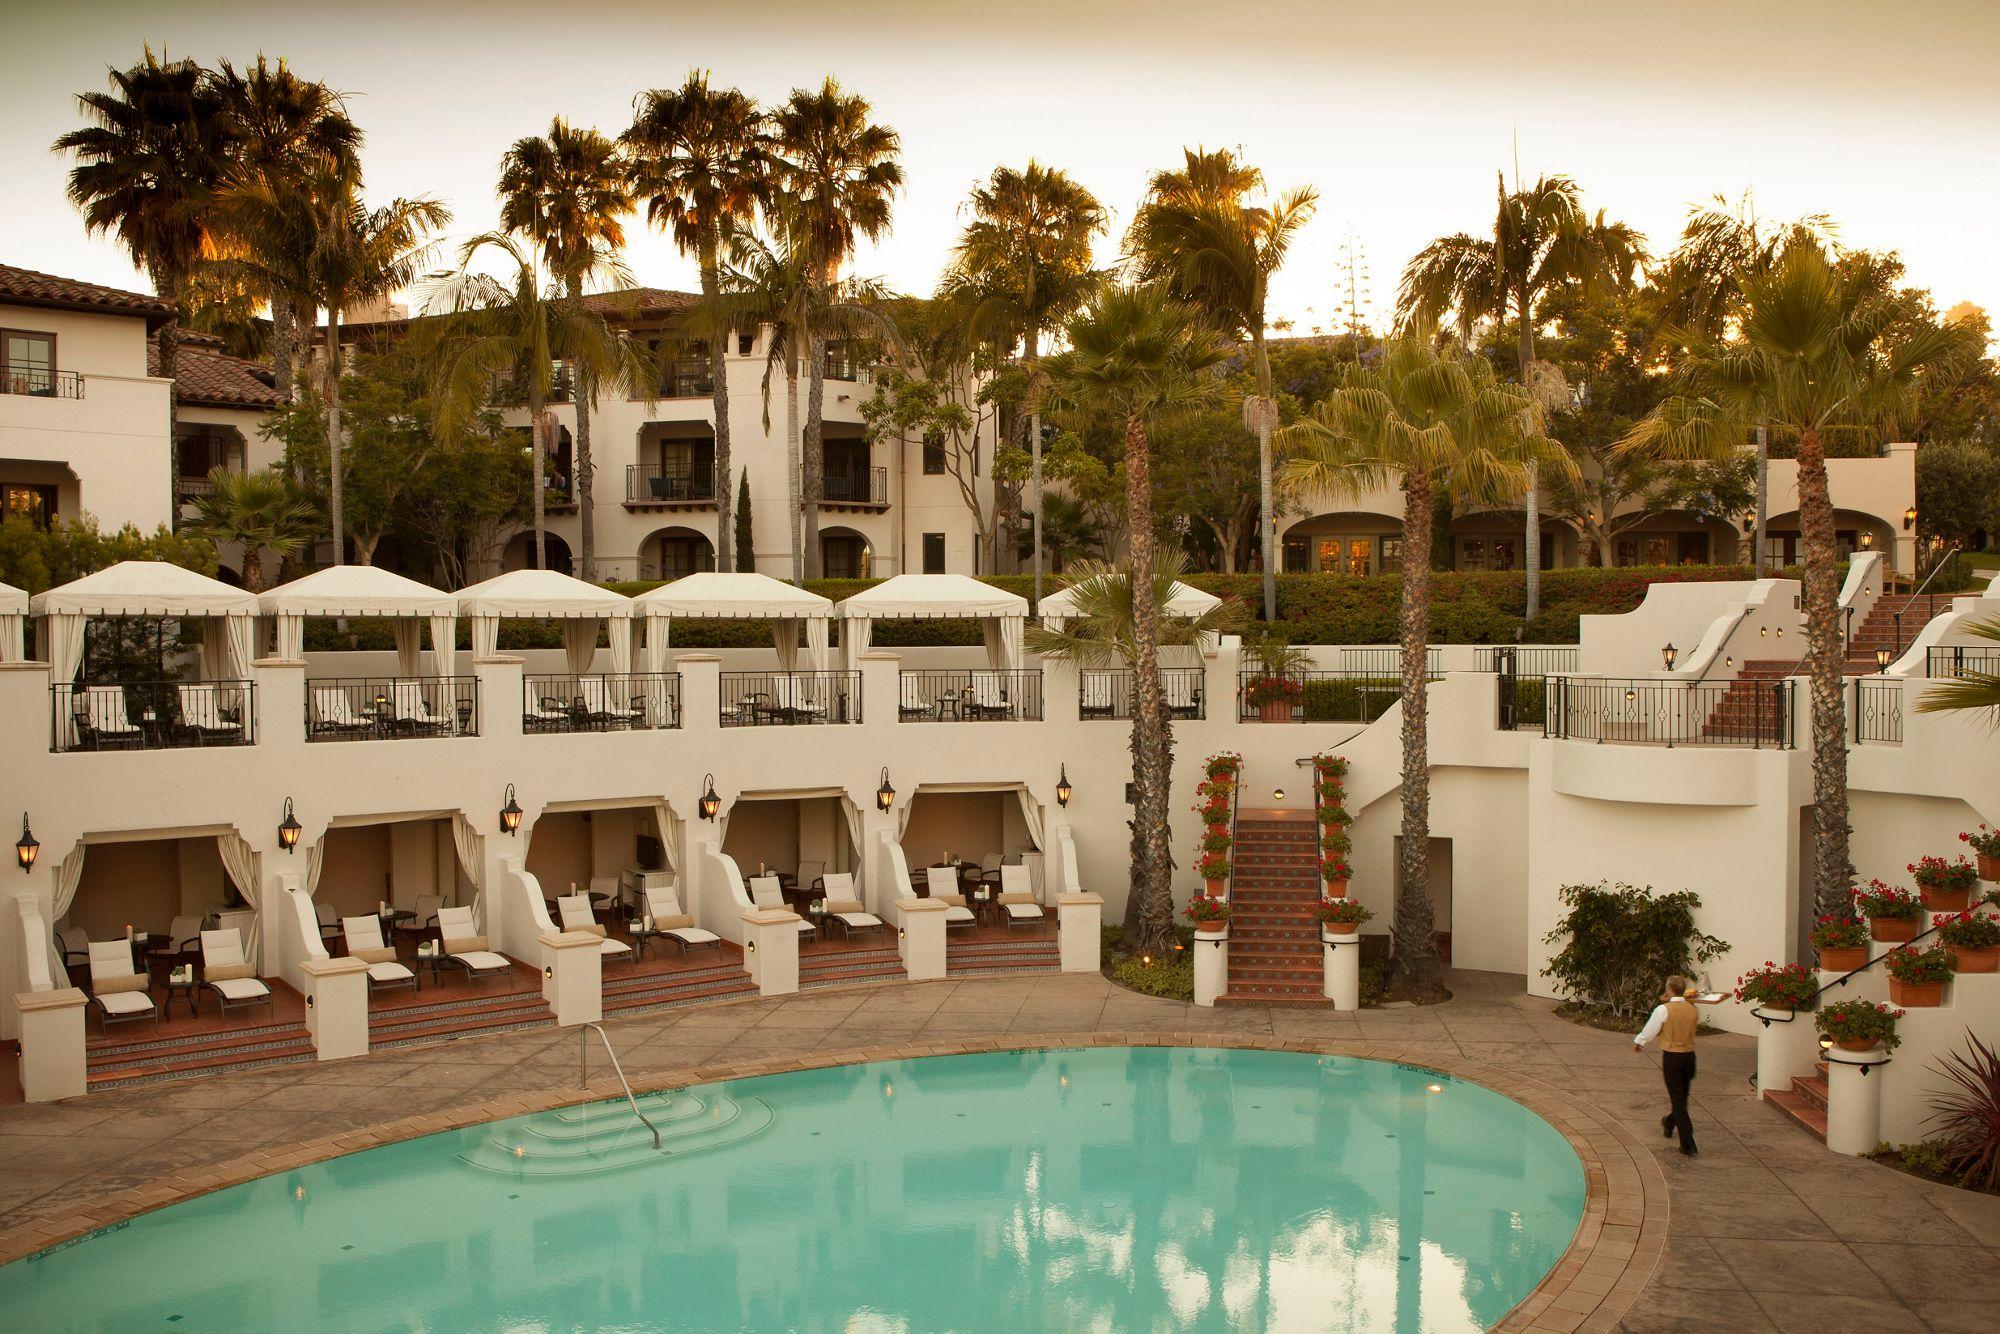 Pool Cabanas The Ritz Carlton Bacara Santa Barbara